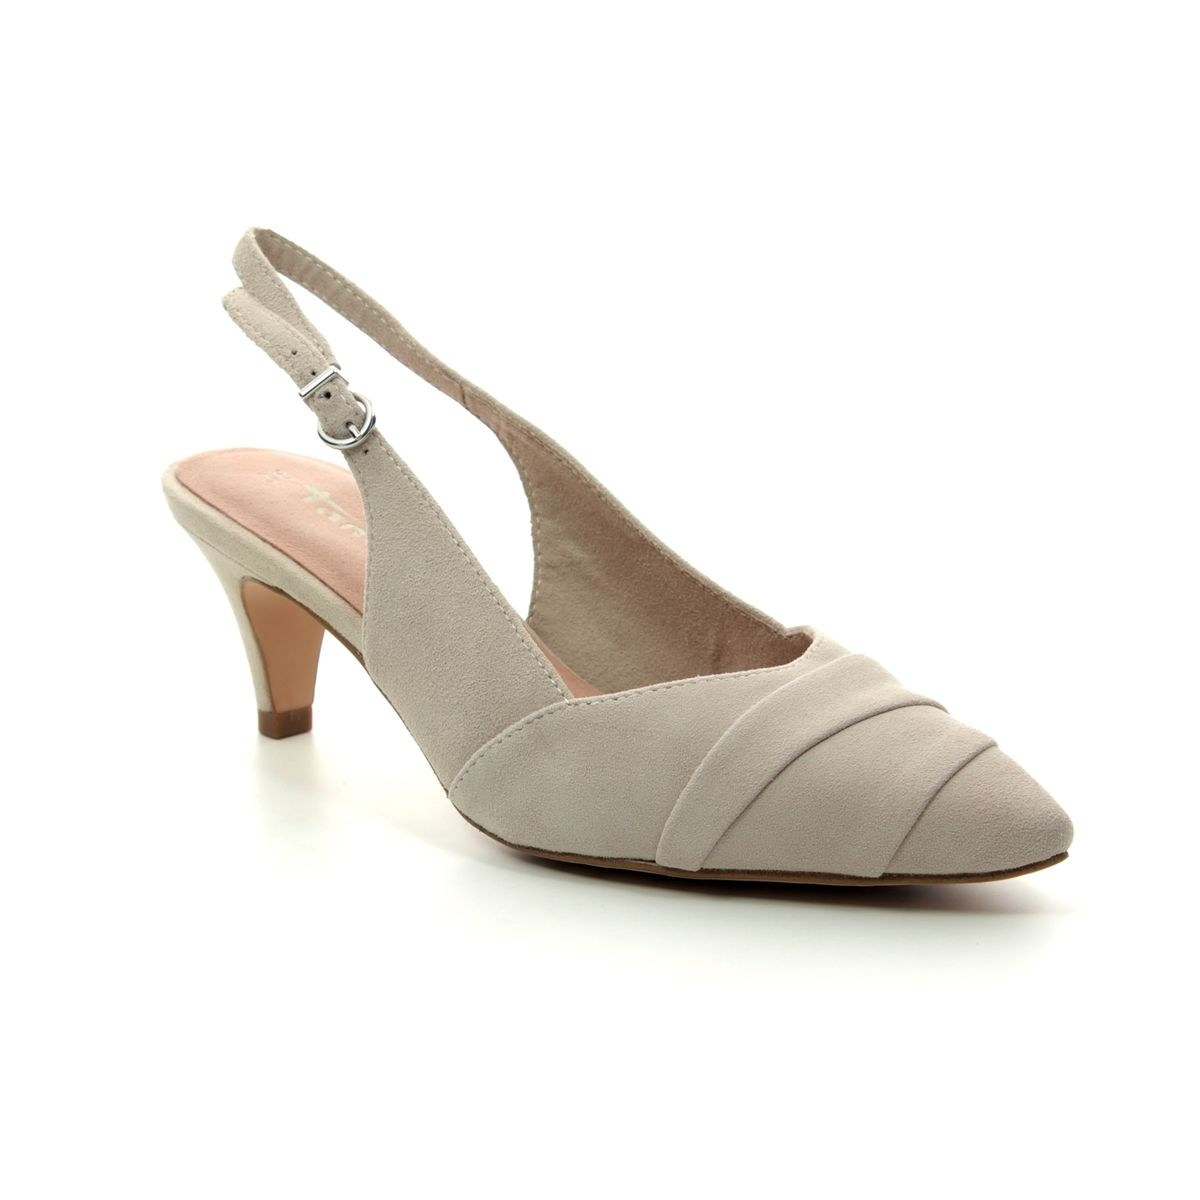 a6cf3abc734 Tamaris Slingback Shoes - Beige suede - 29616 32 375 FATSIA SLING